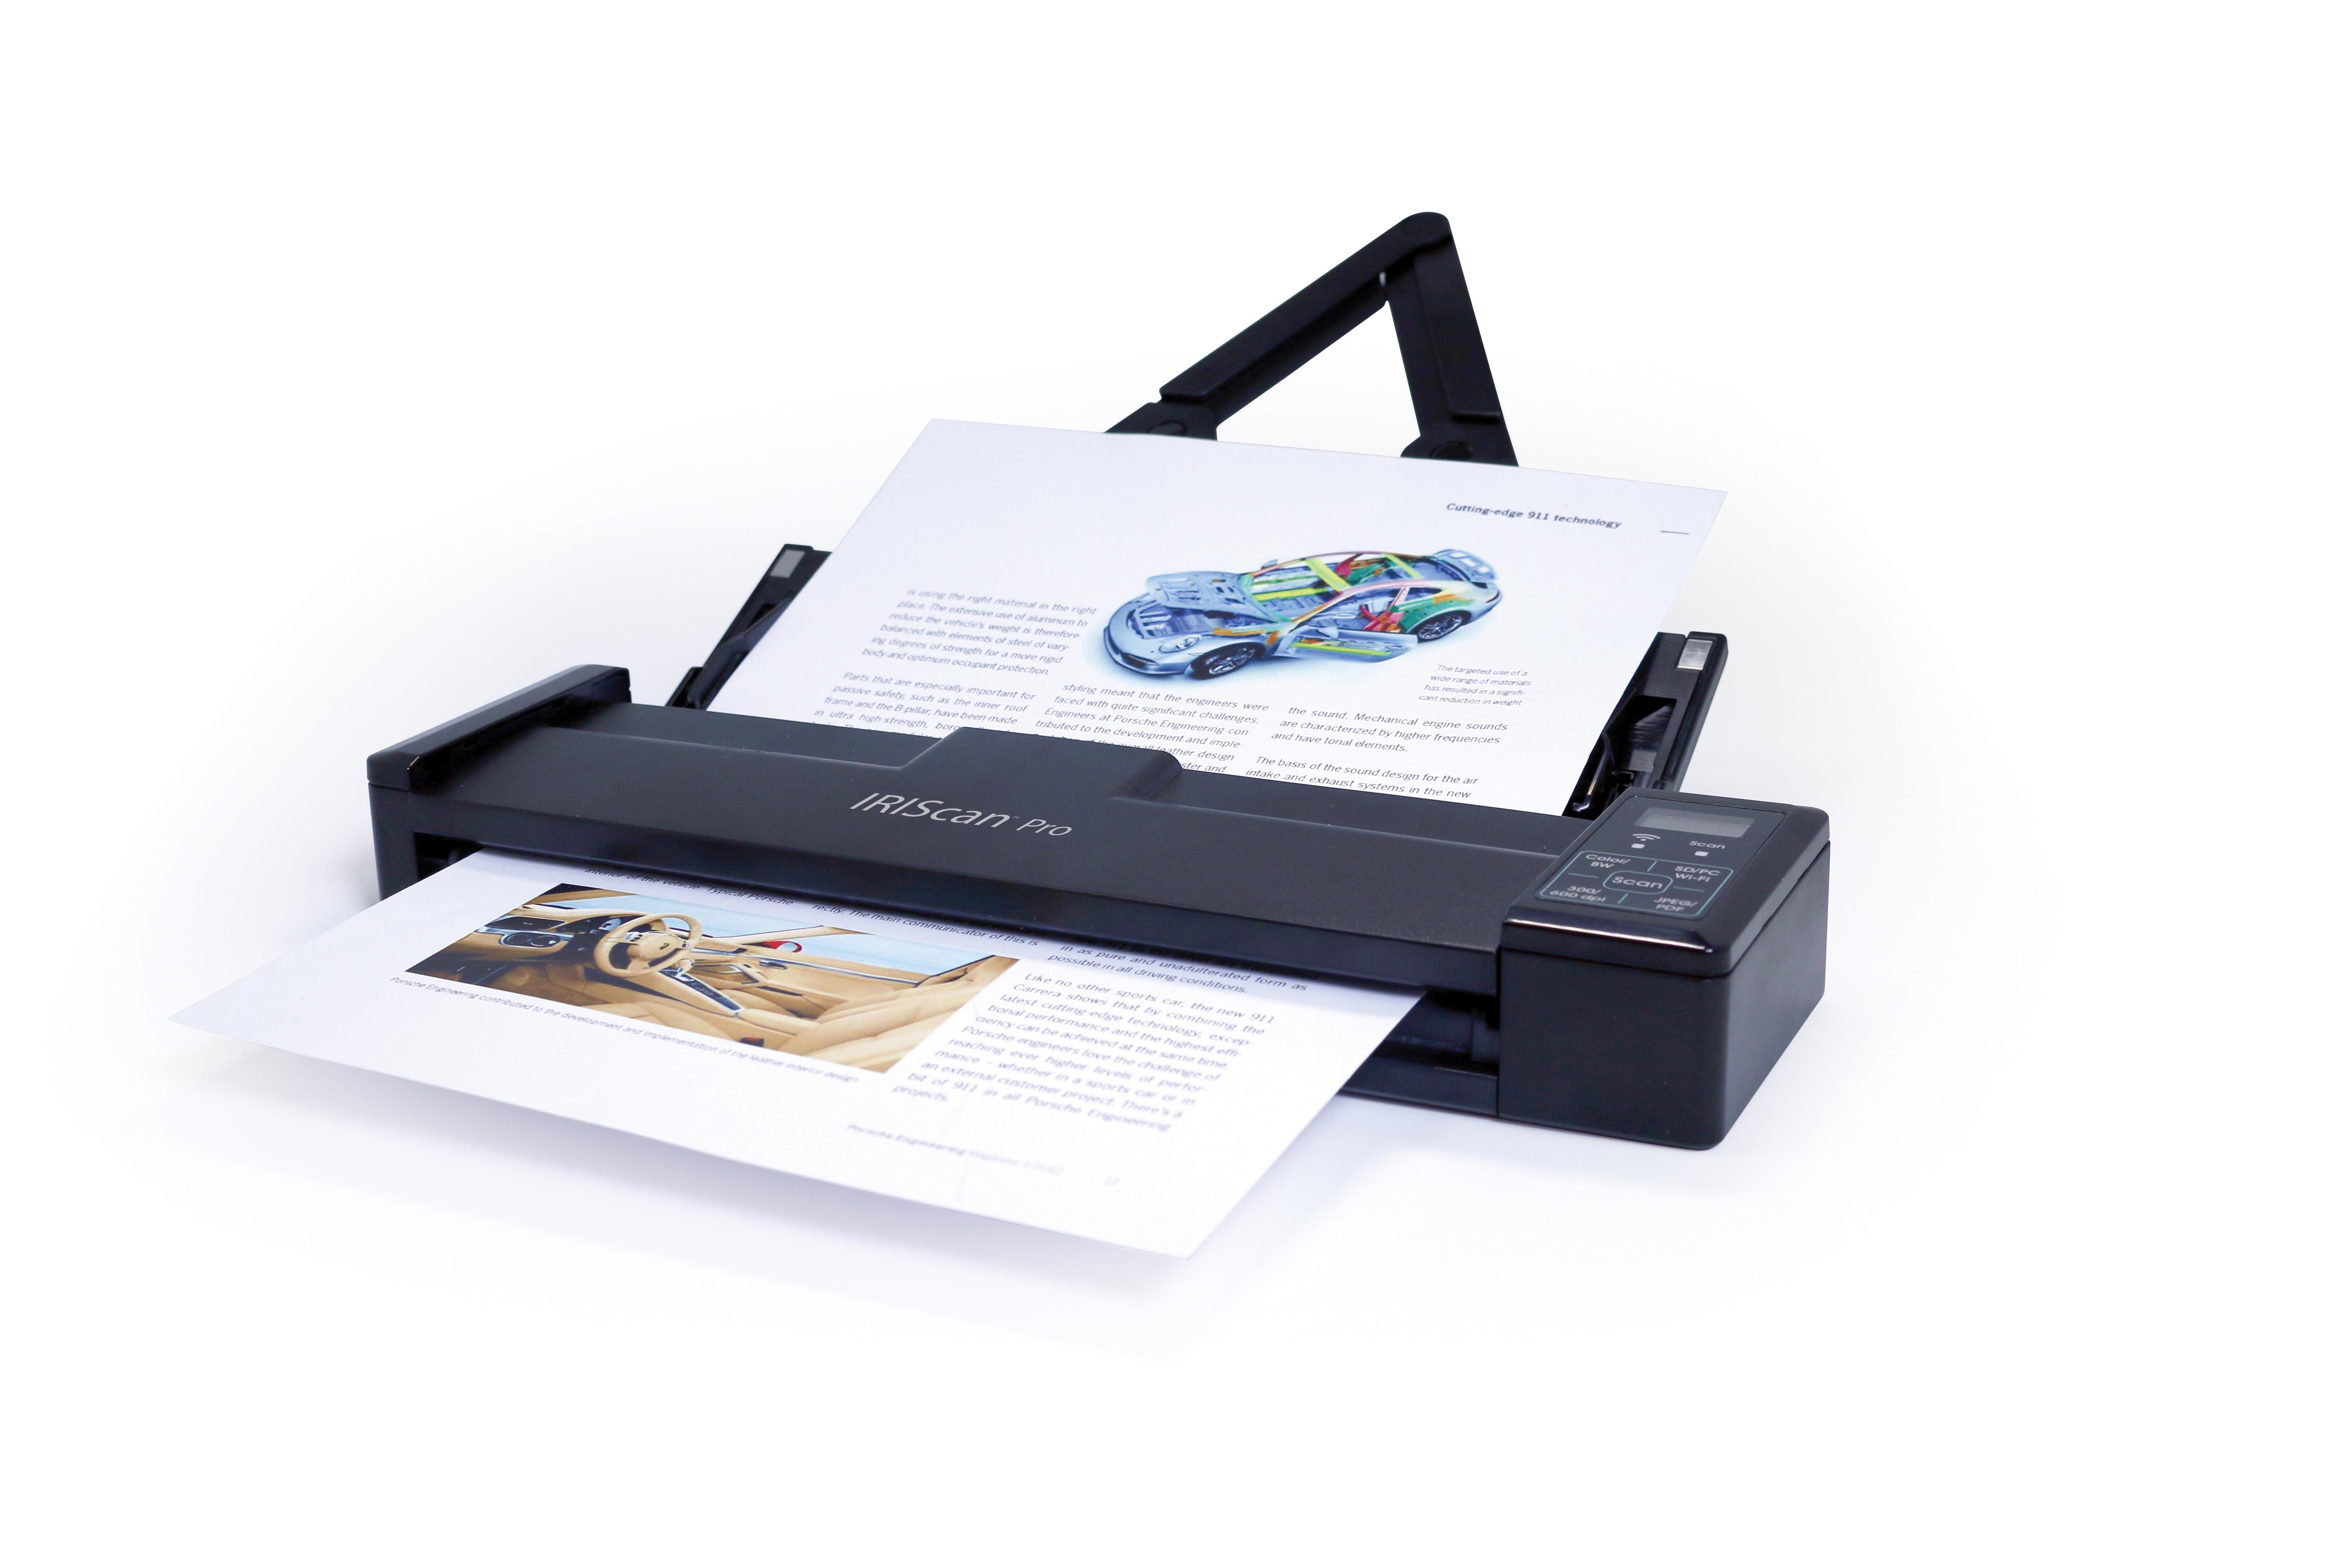 IRIS IRIScan Pro 3 Wi-Fi Bogendrucker 600 x 600DPI A4 Schwarz